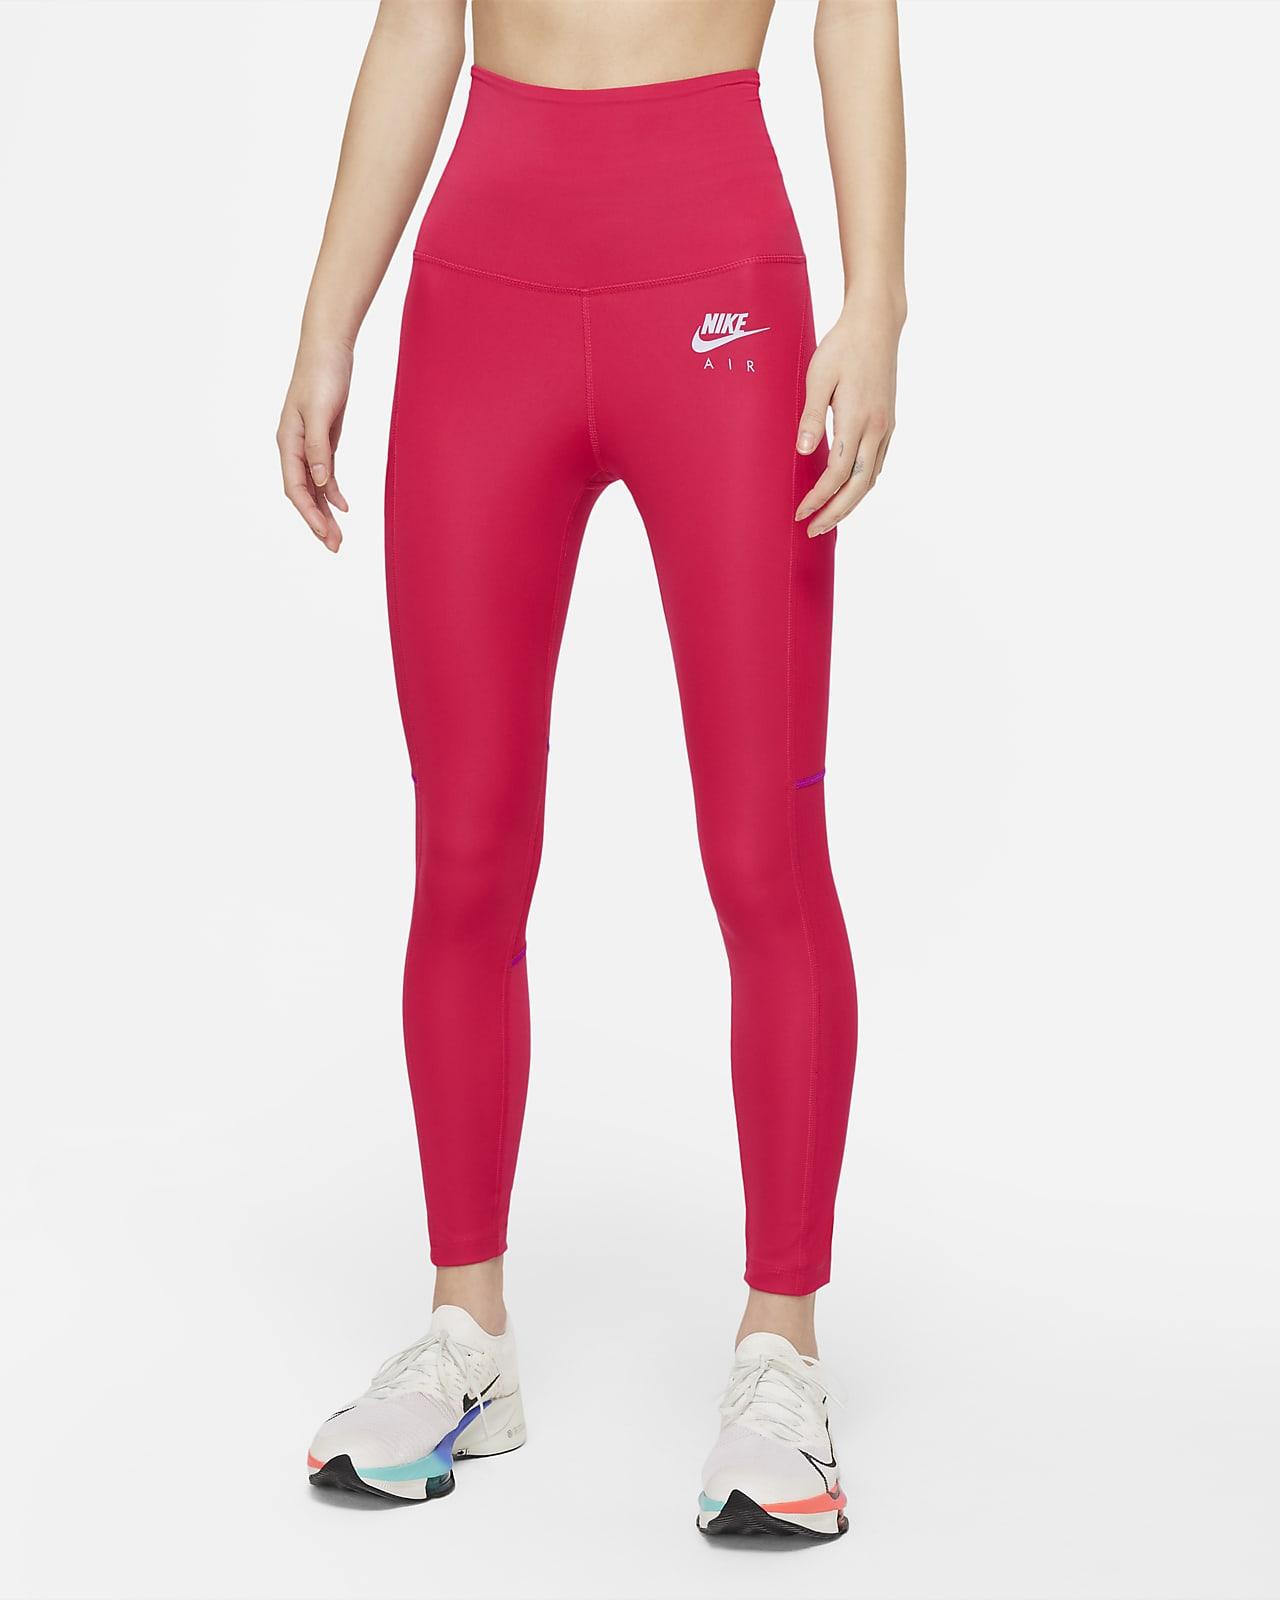 Nike Air Dri-FIT 女款可折式褲頭跑步九分內搭褲